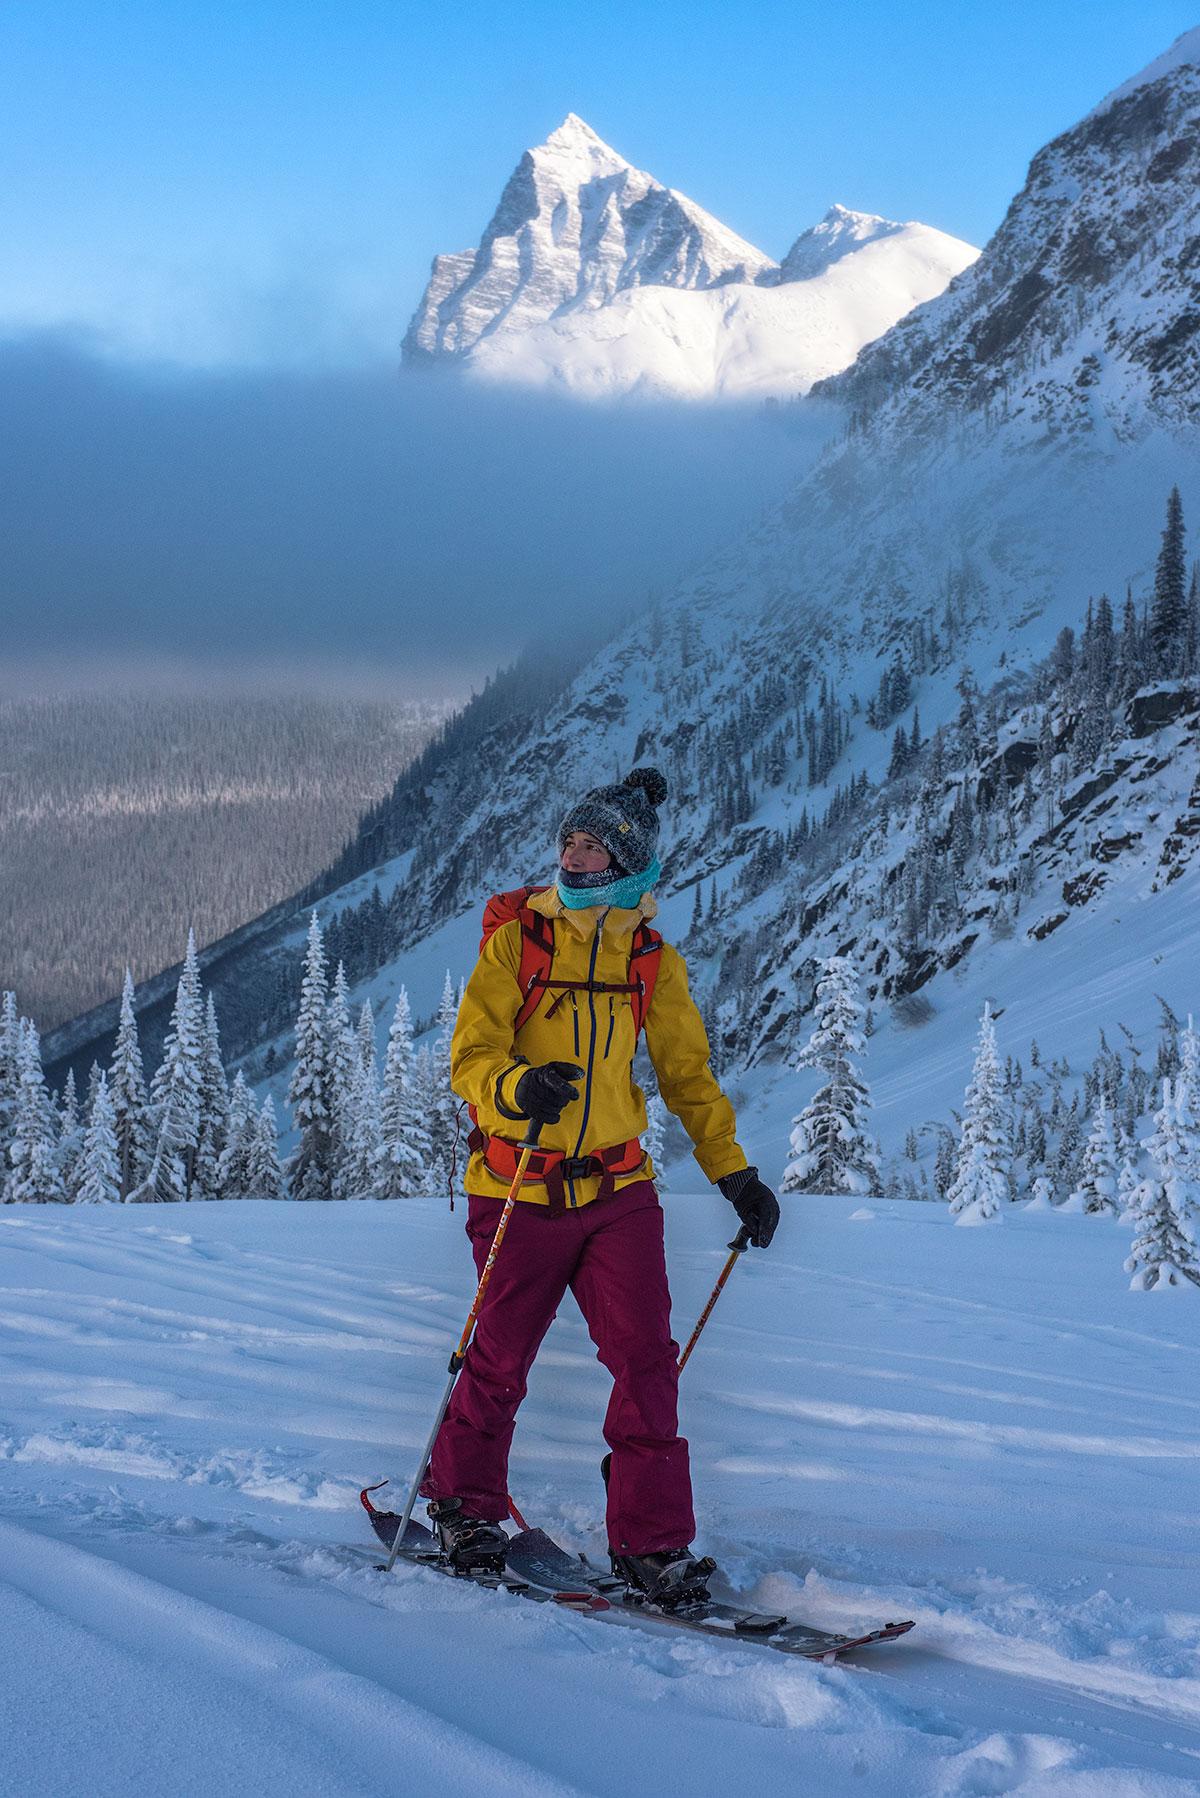 austin-trigg-patagonia-banff-alberta-winter-splitboard-rogers-pass-canada-inversion-layer-mountain-skin-tour-backcountry.jpg